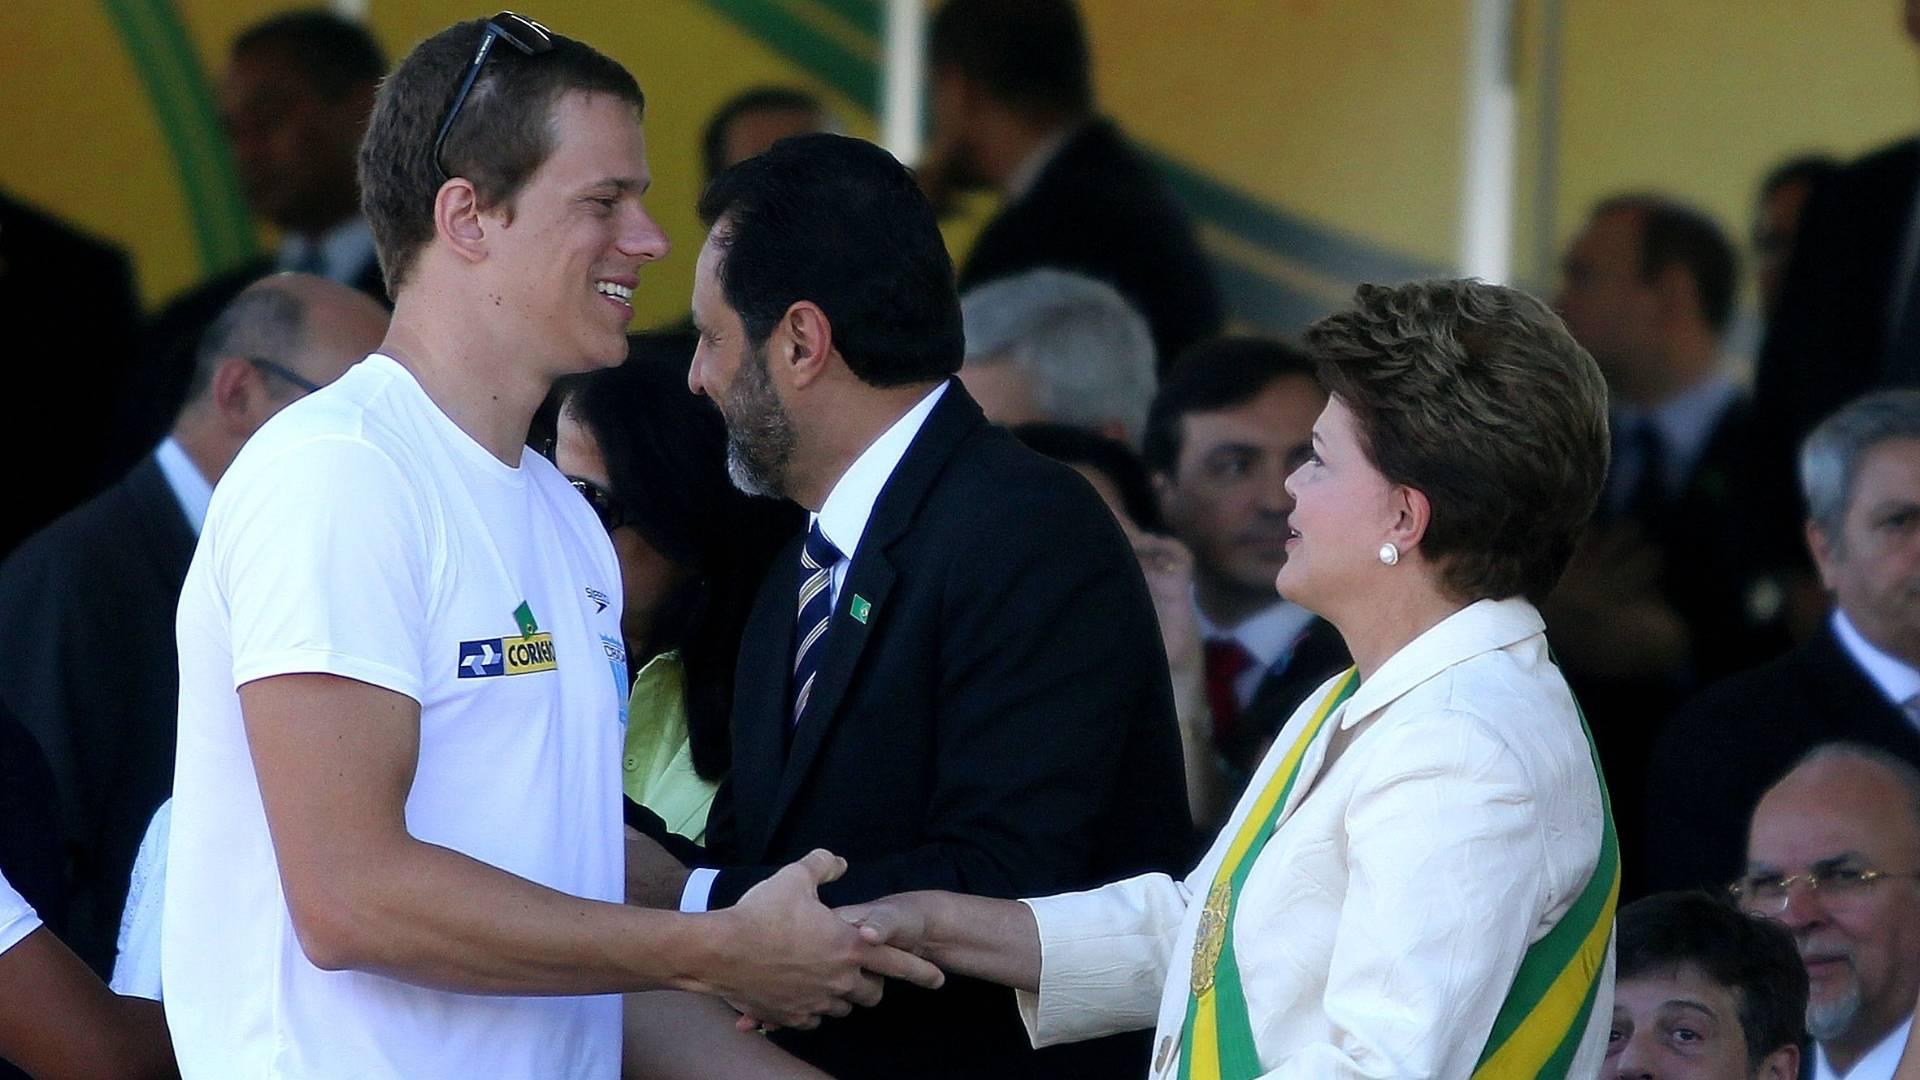 Cesar Cielo cumprimenta Dilma Rousseff durante o desfile do dia da Independência em Brasília (07/09/2011)